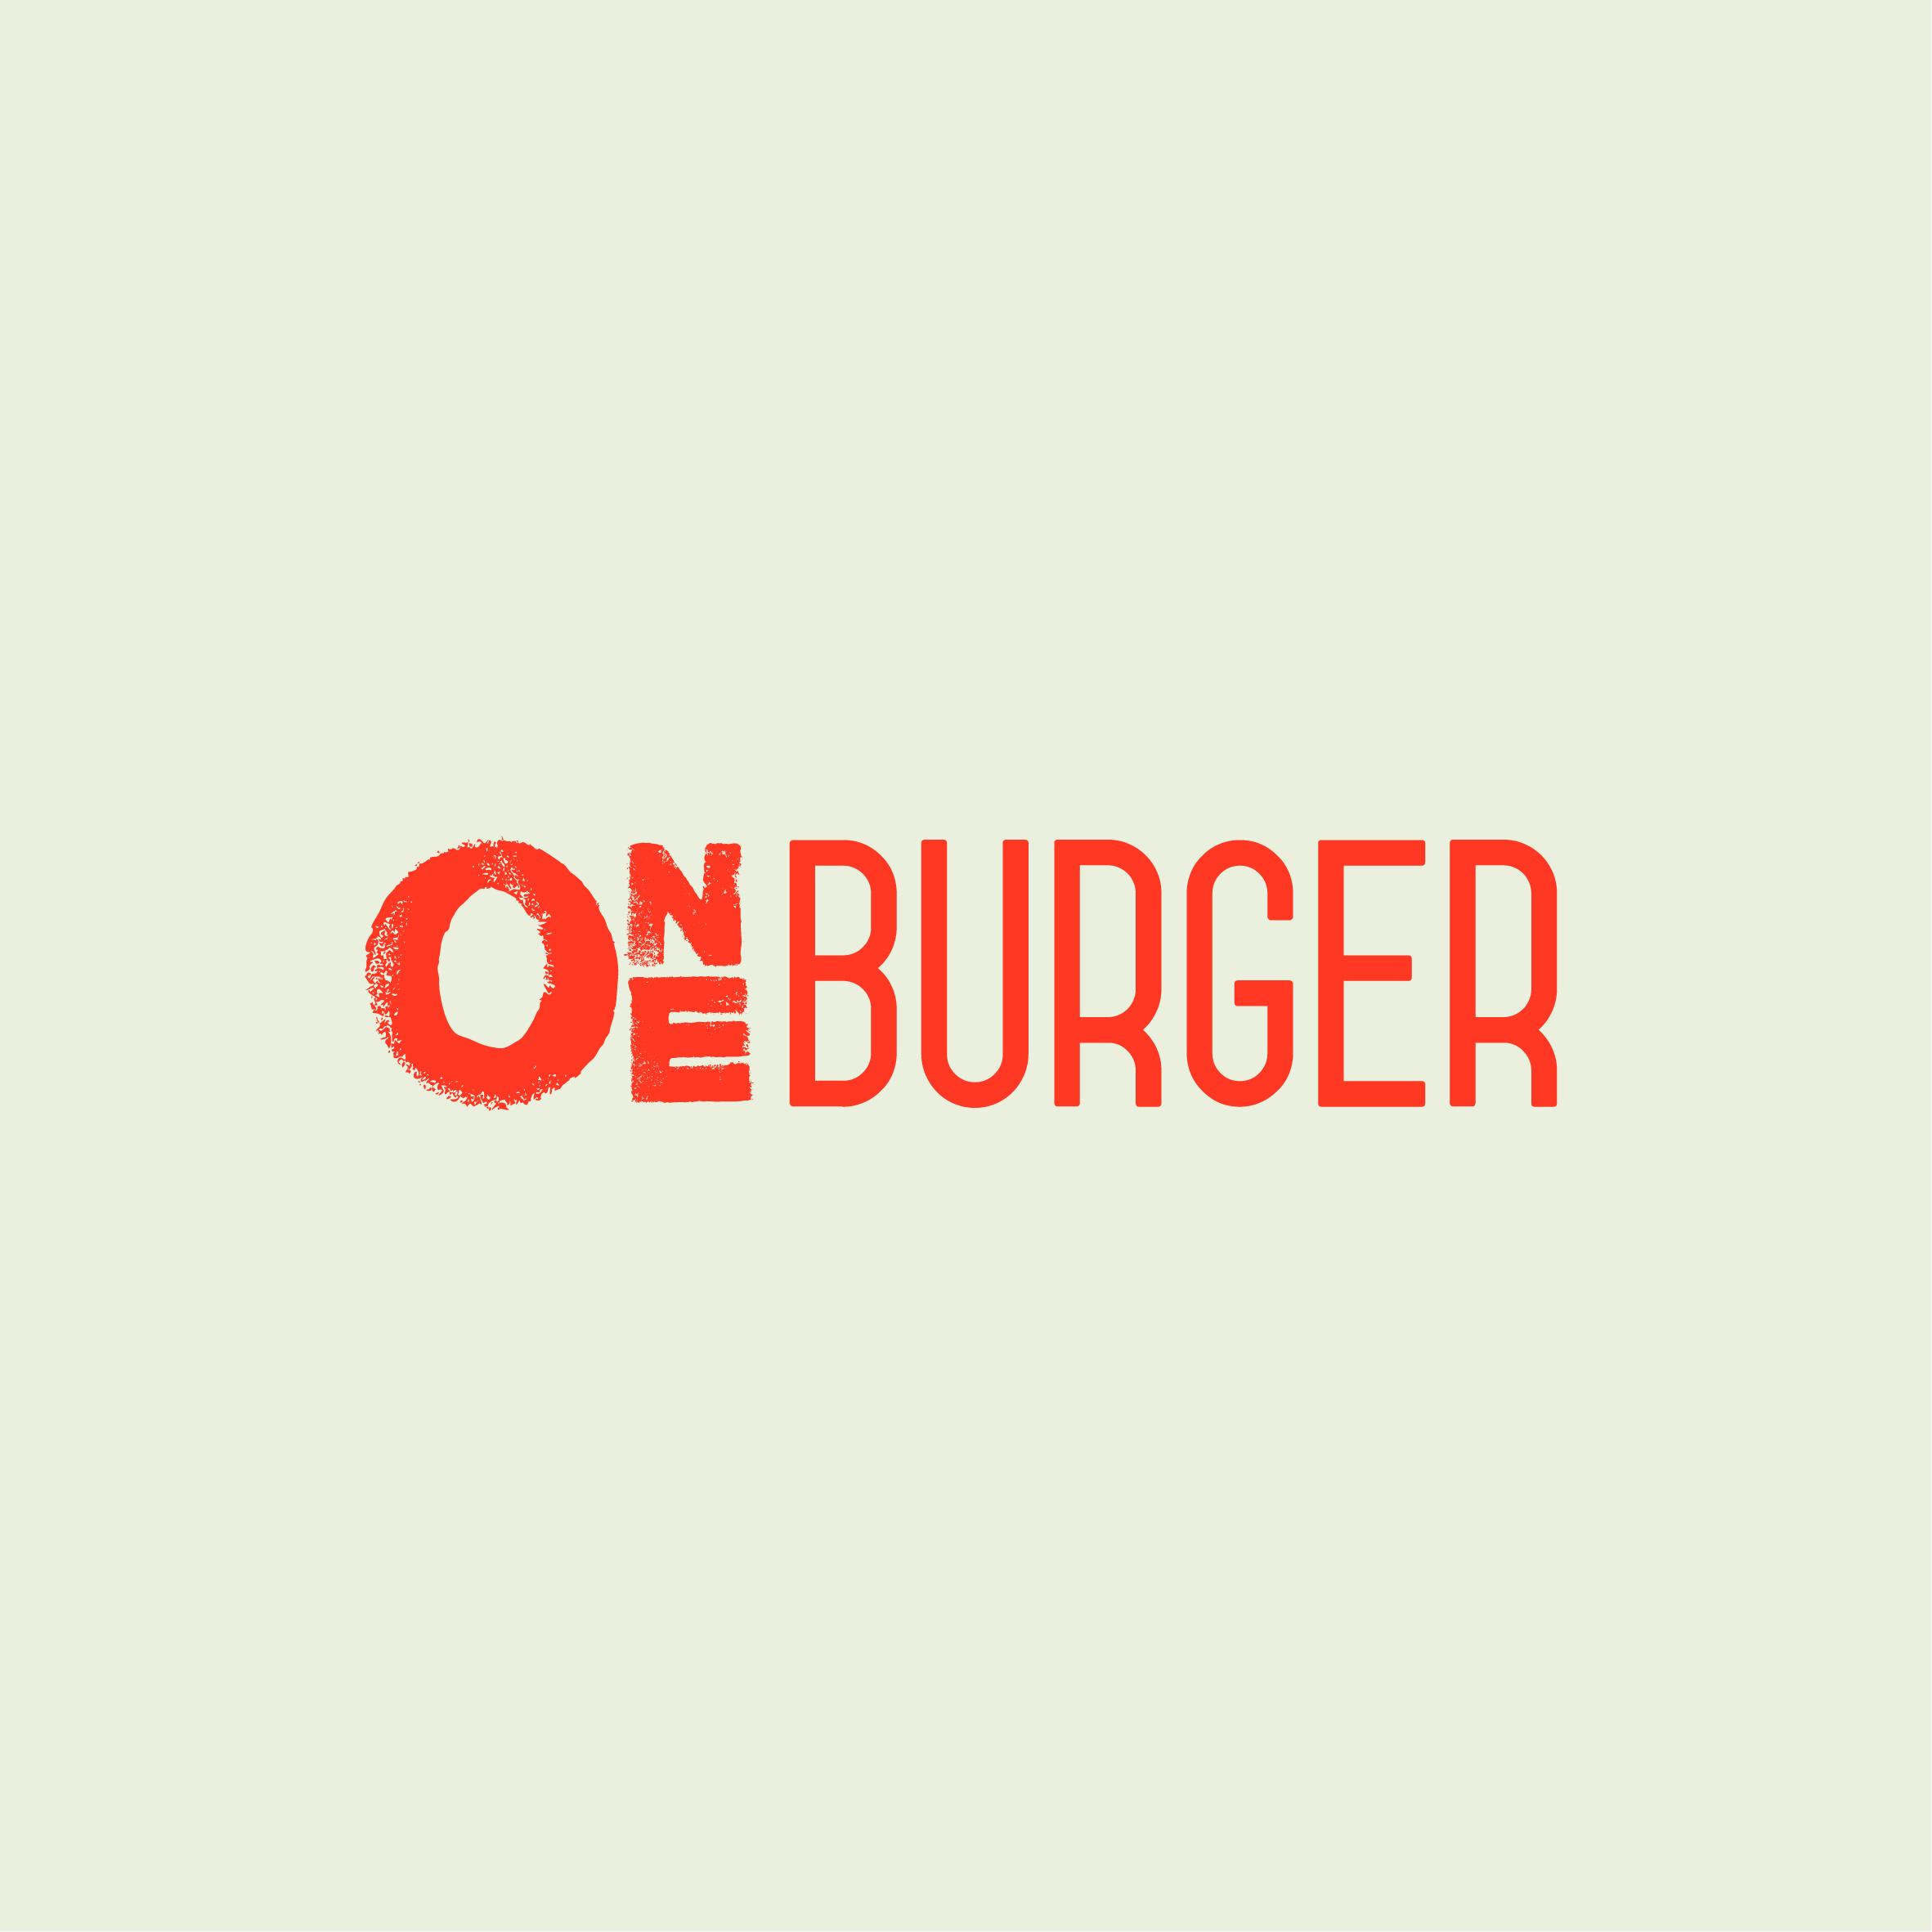 oneburgerone-01